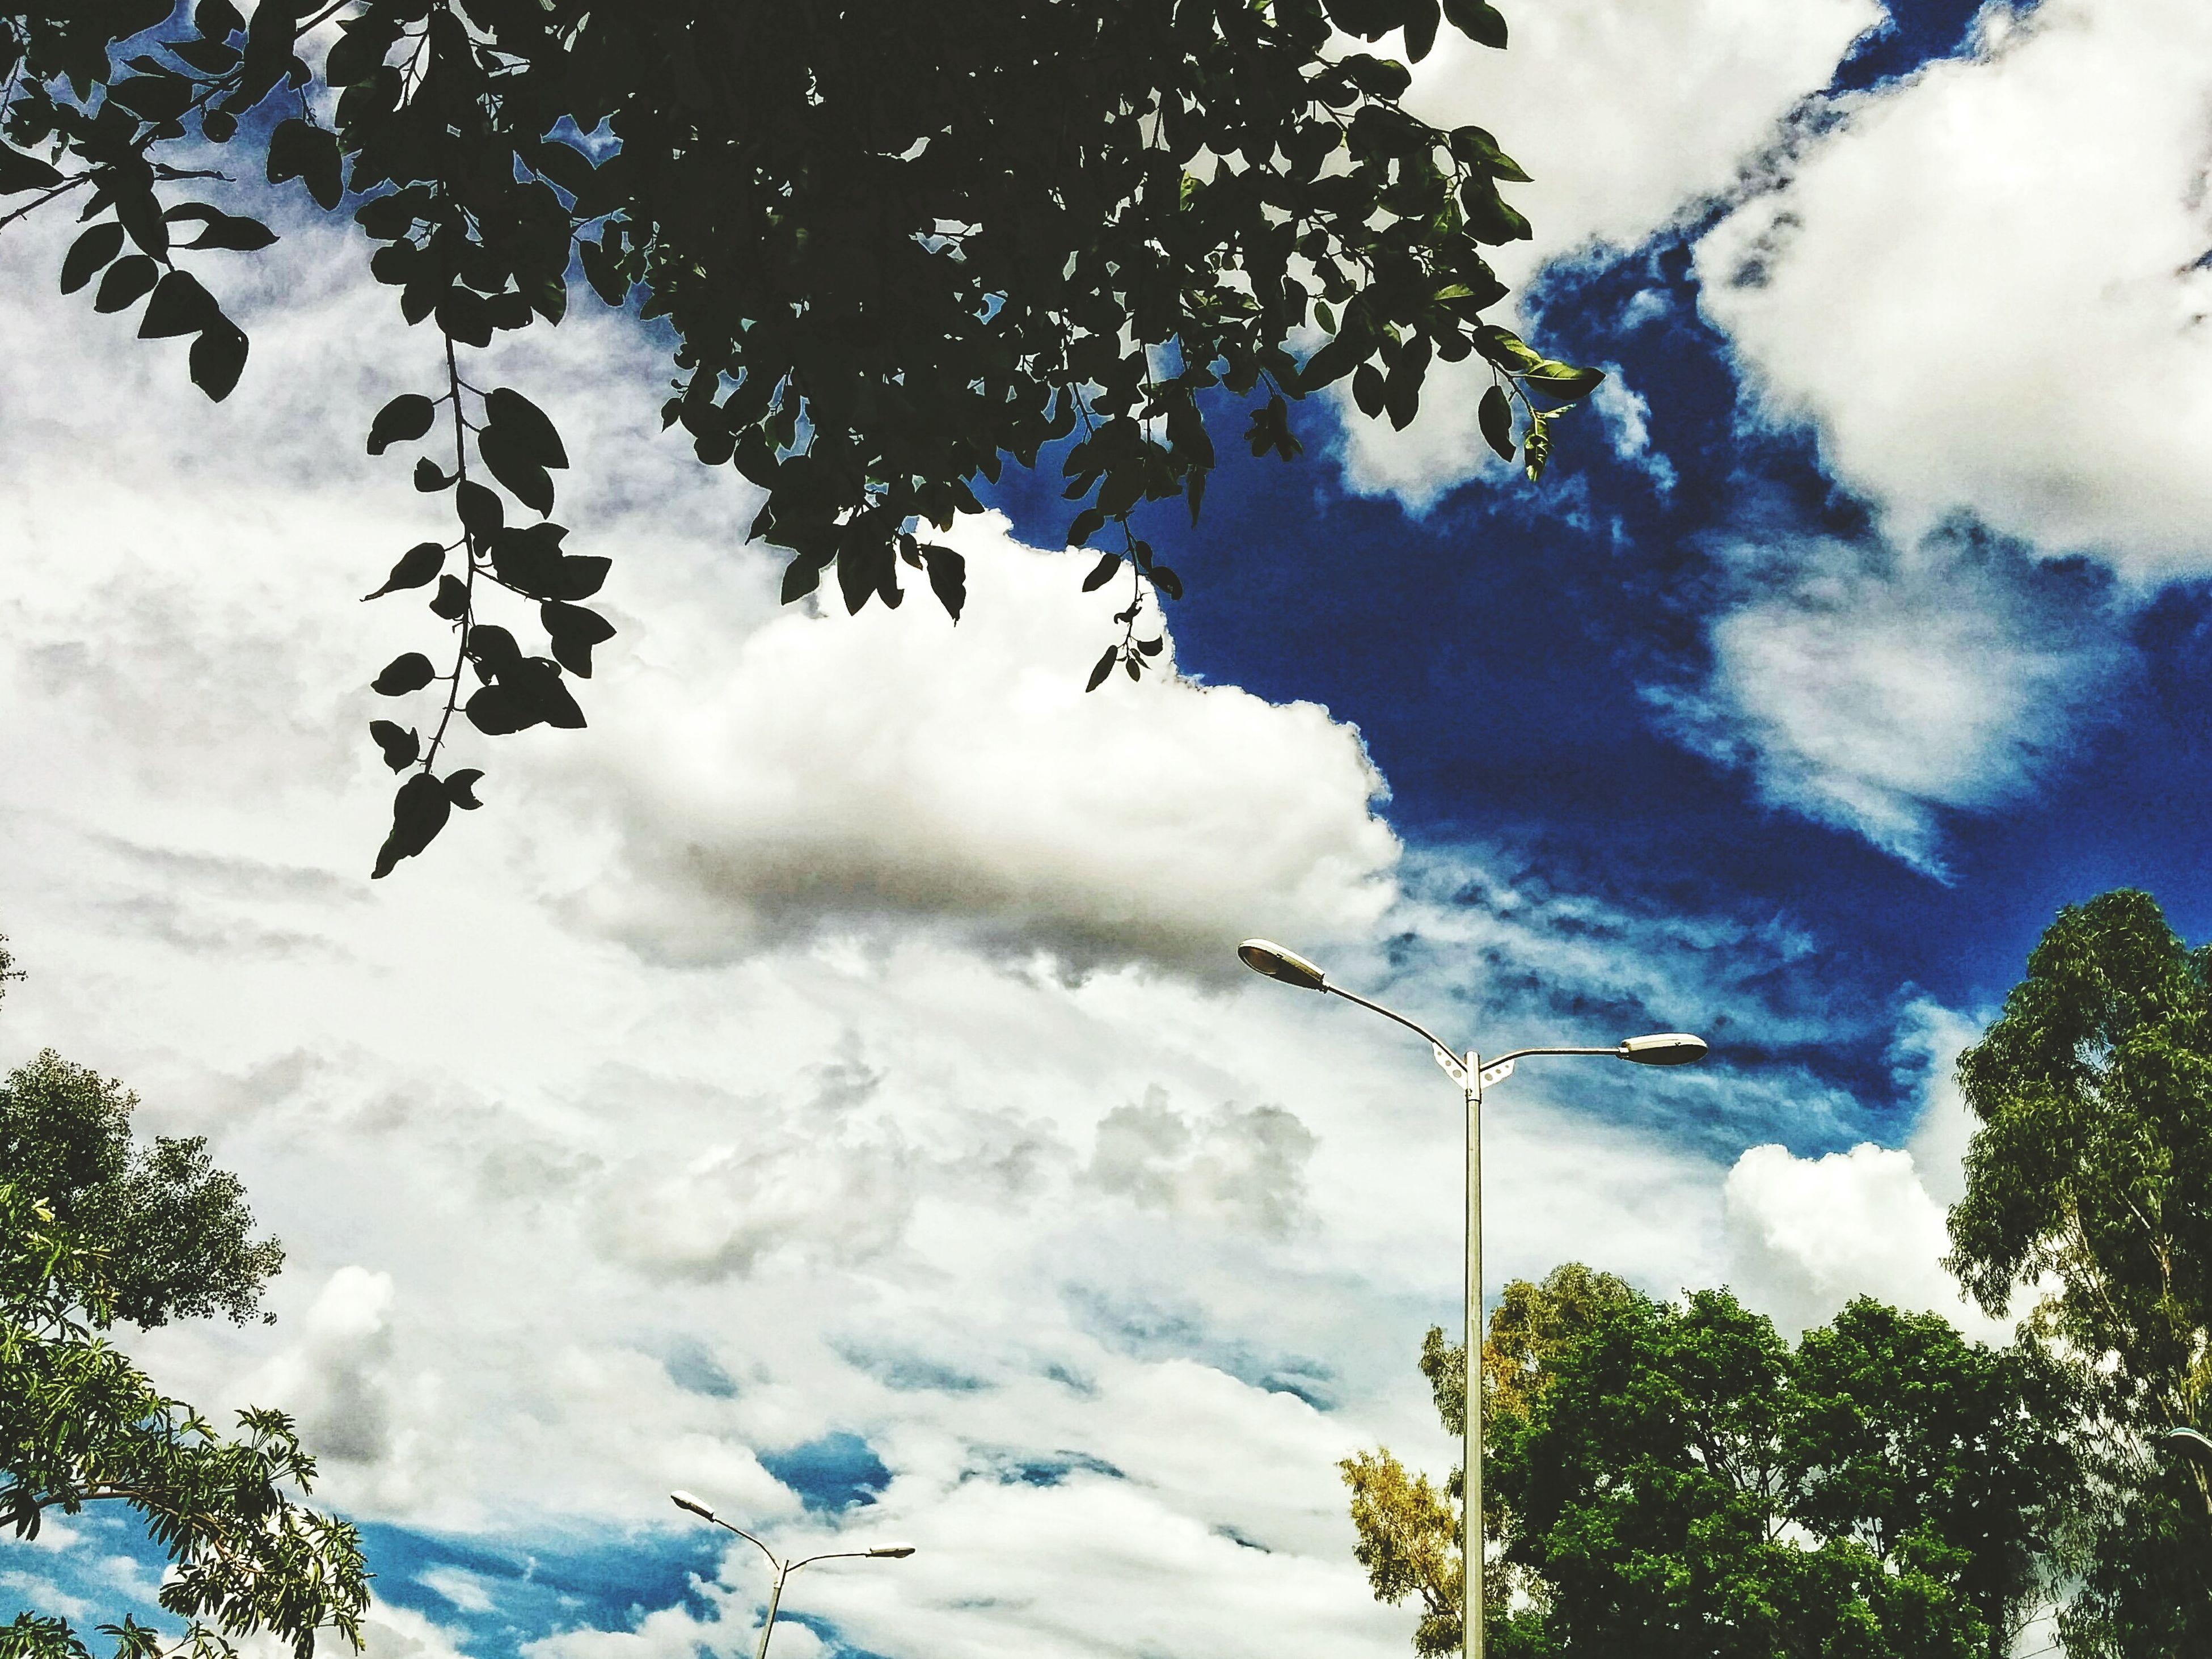 Blue sky. Cloudporn Bluesky Firstpostof2015 Nexus5 Nexus5photography Beautifulday Pune India Incredible India Incredibleindia